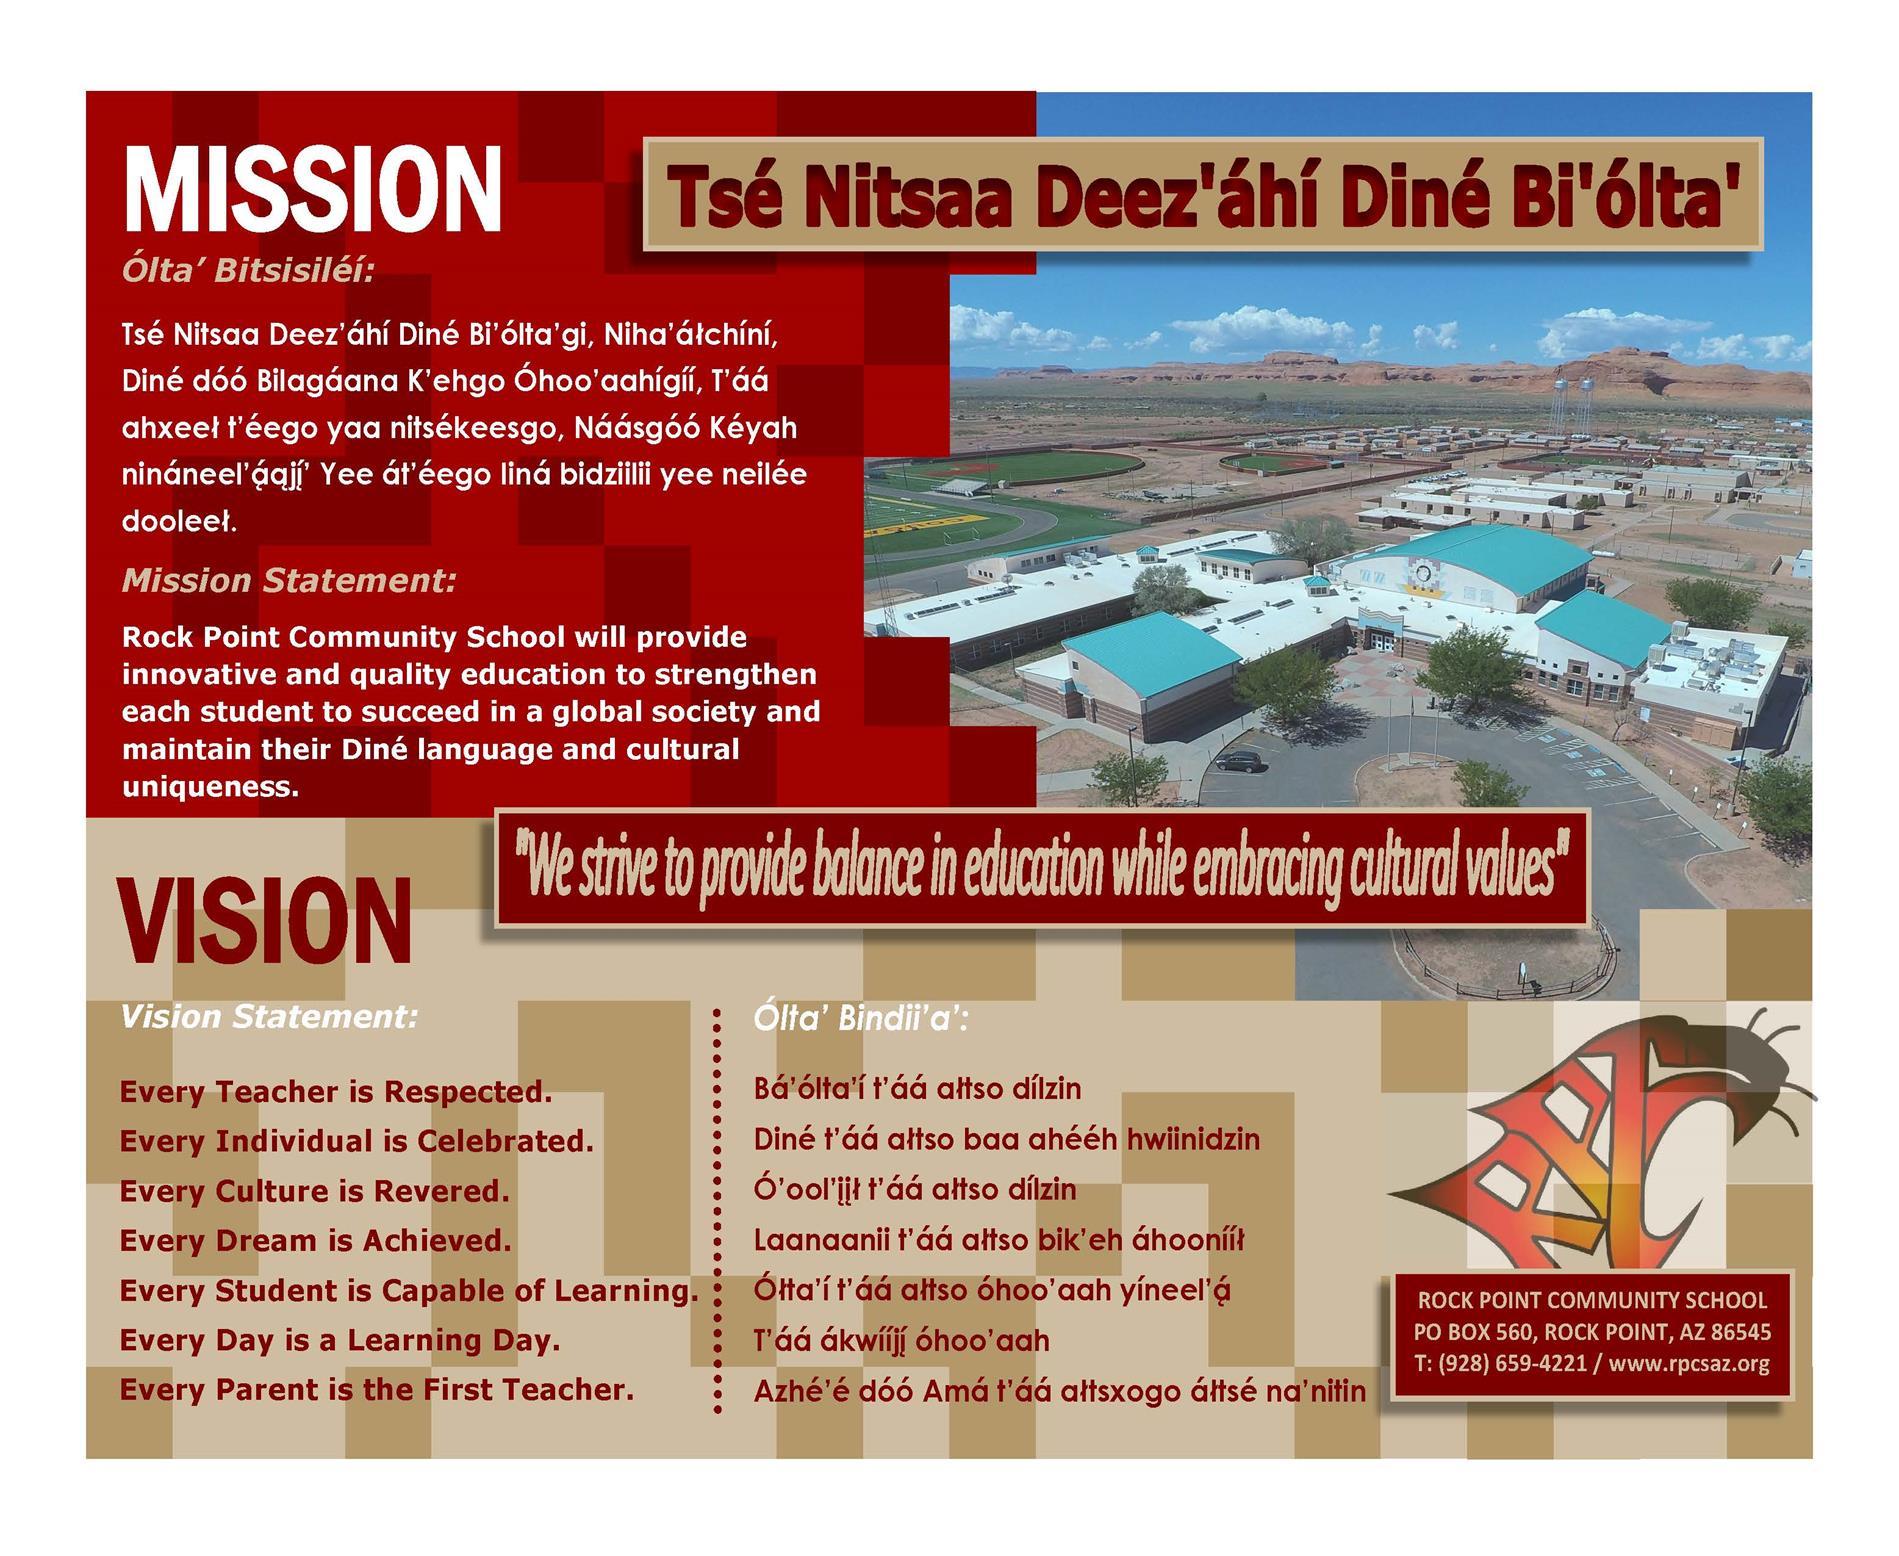 RPCS Mission